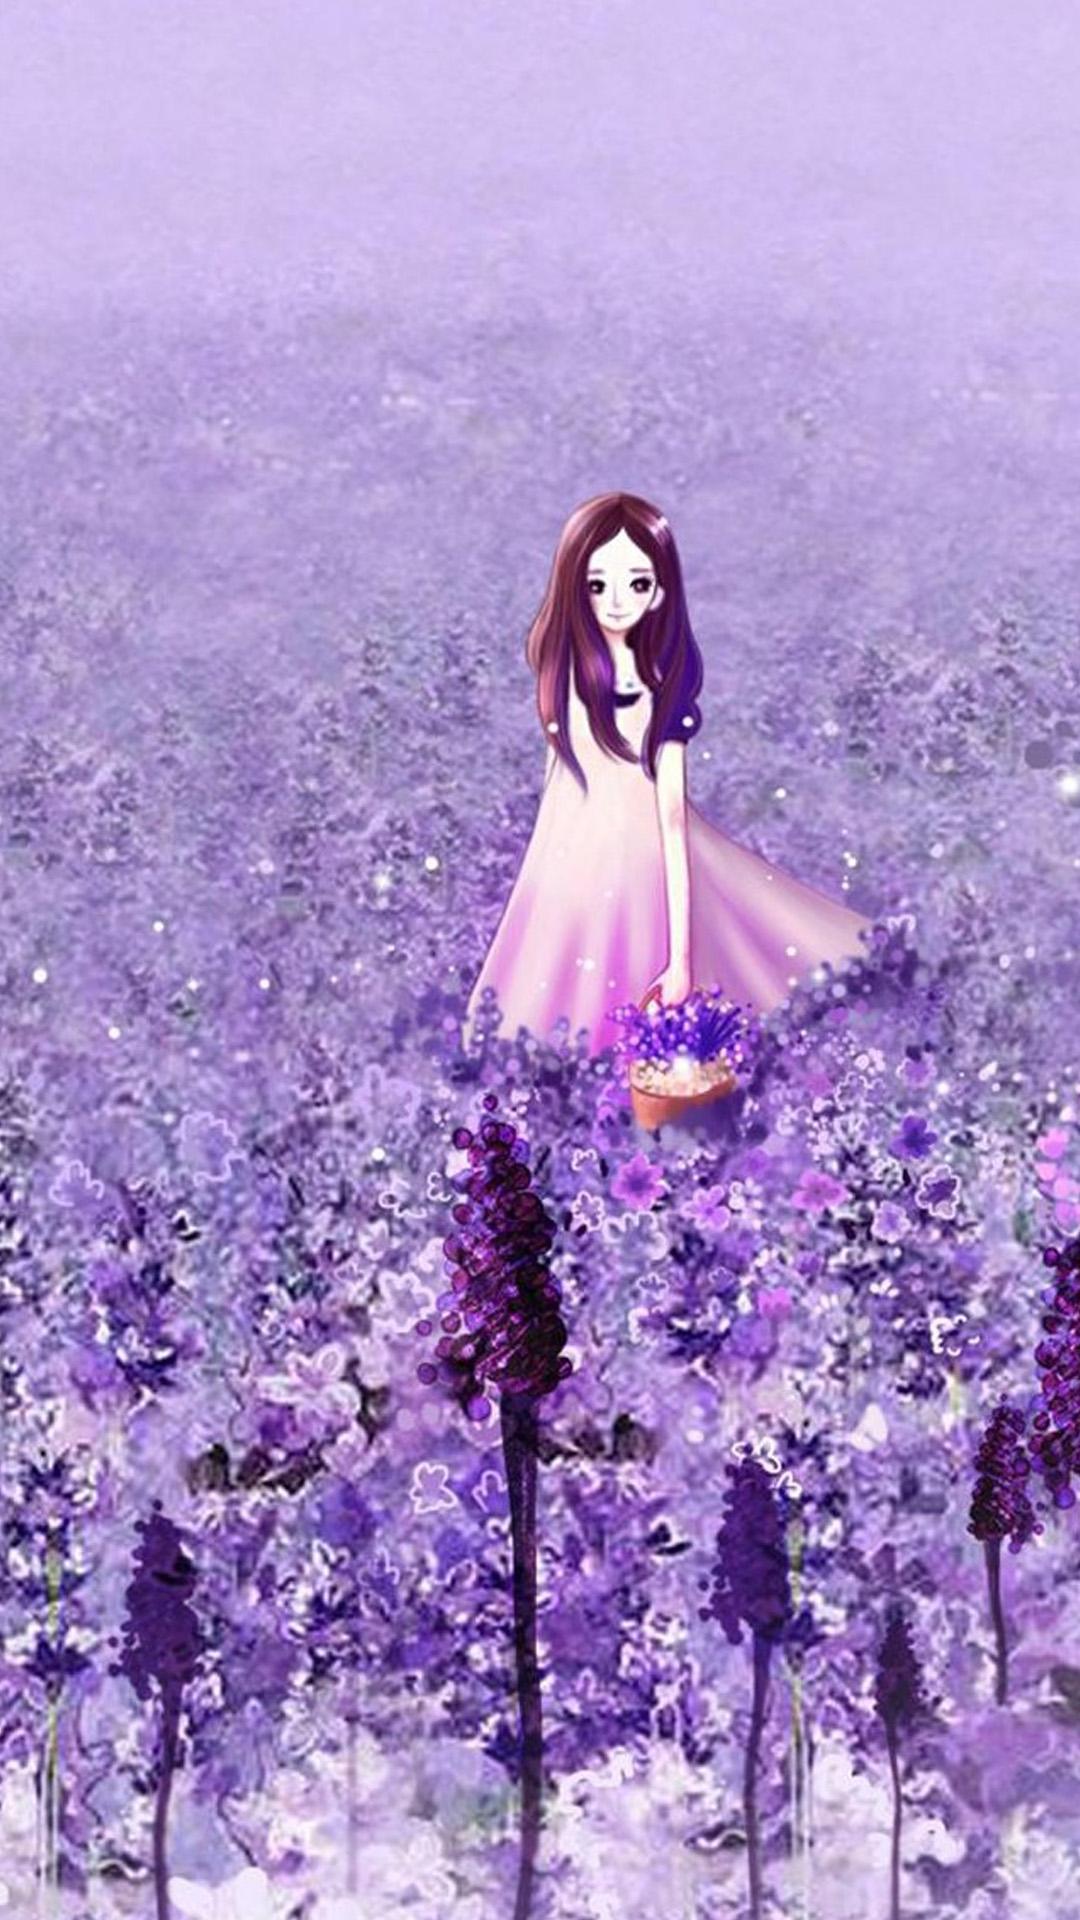 47+ Cute Anime Girl iPhone Wallpaper on WallpaperSafari